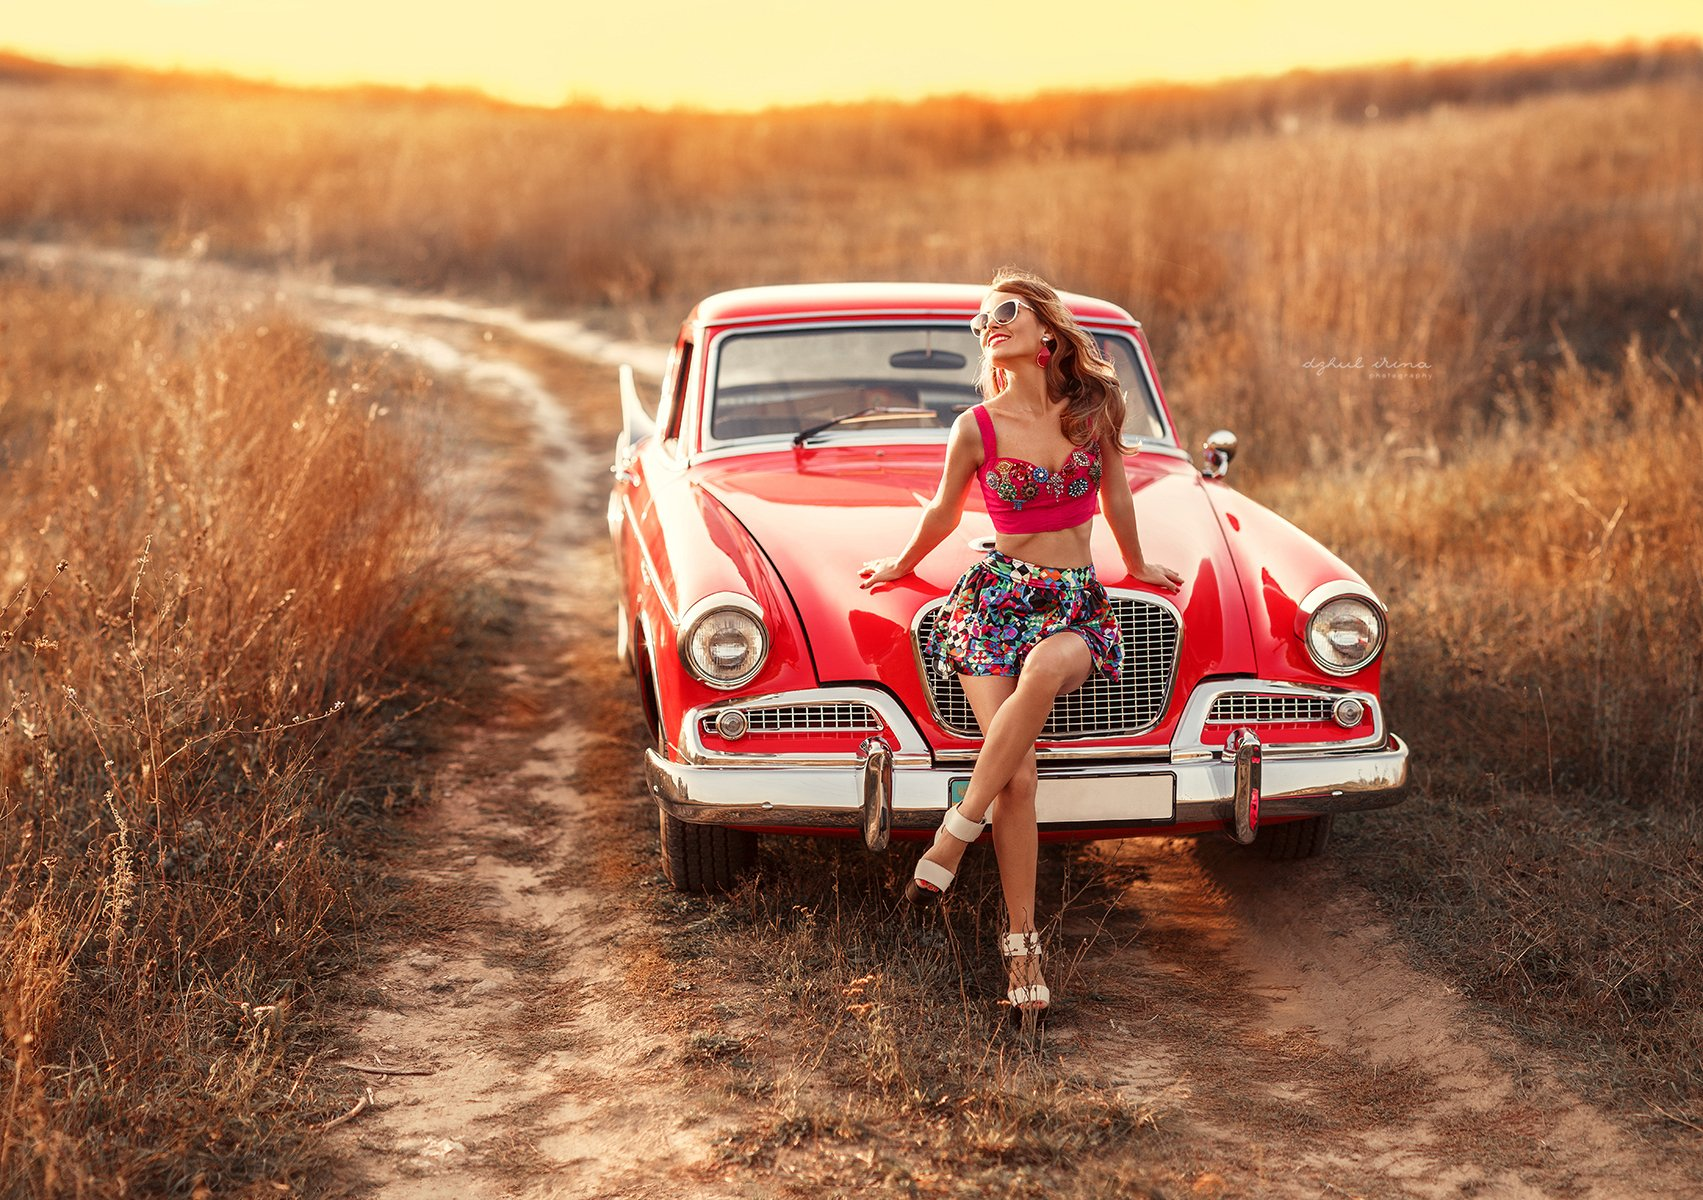 Canon, Canon 5D Mark III, Car, Dzhul irina, Girl, Irinadzhul, People, Photo, Photography, Photoshop, Popular, Portrait, Sunset, Автомобиль, Девушка, Закат, Люди, Портерт, Ирина Джуль